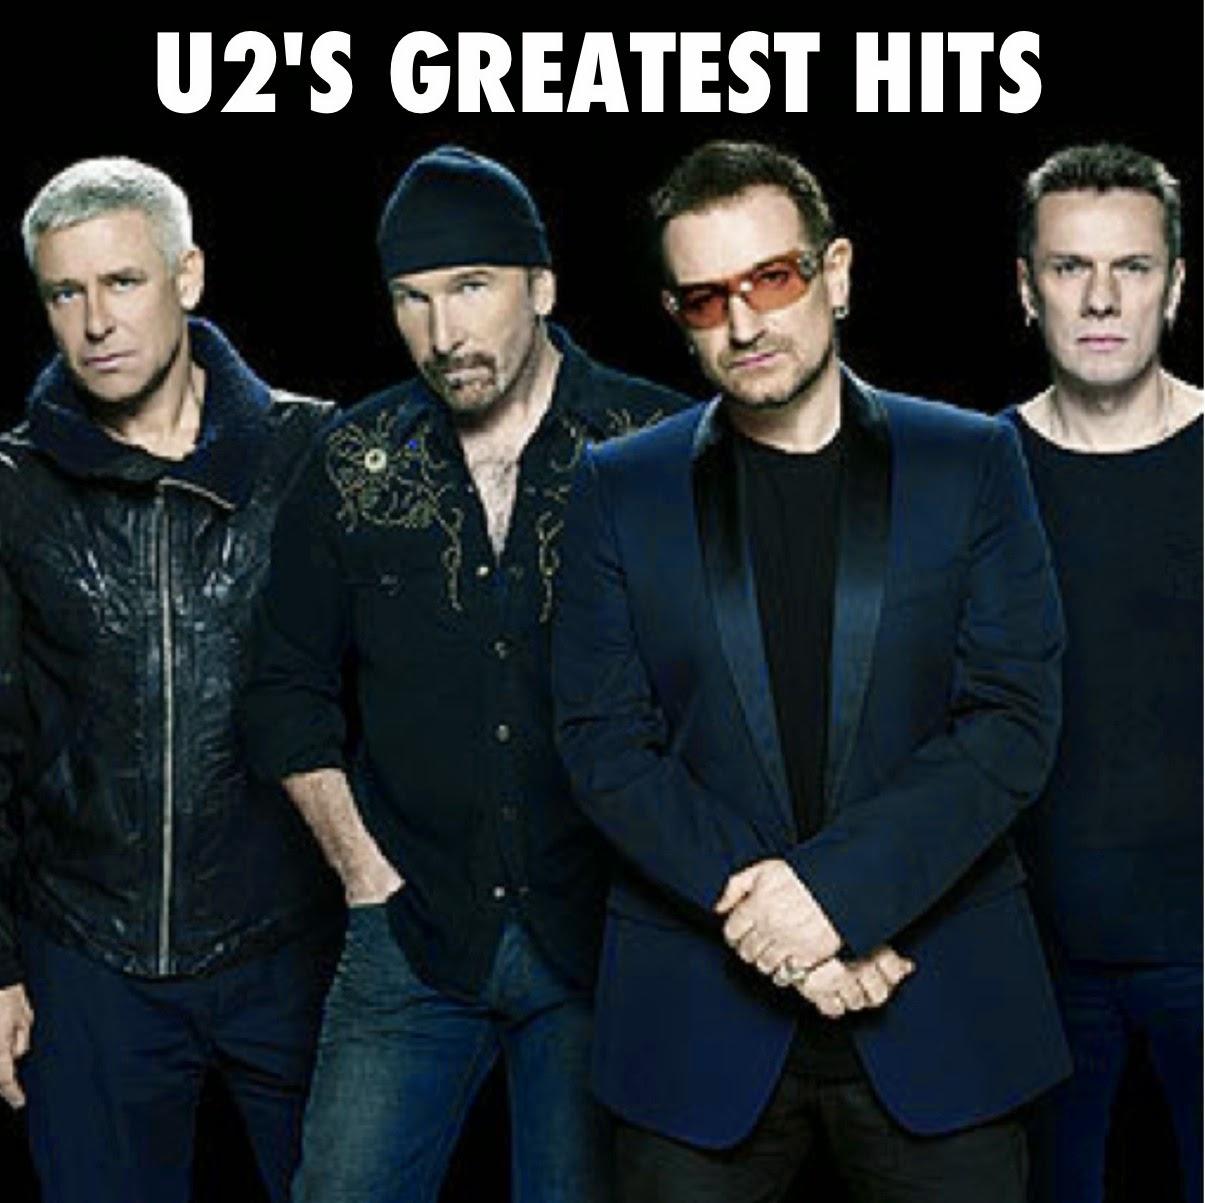 u2 top hits